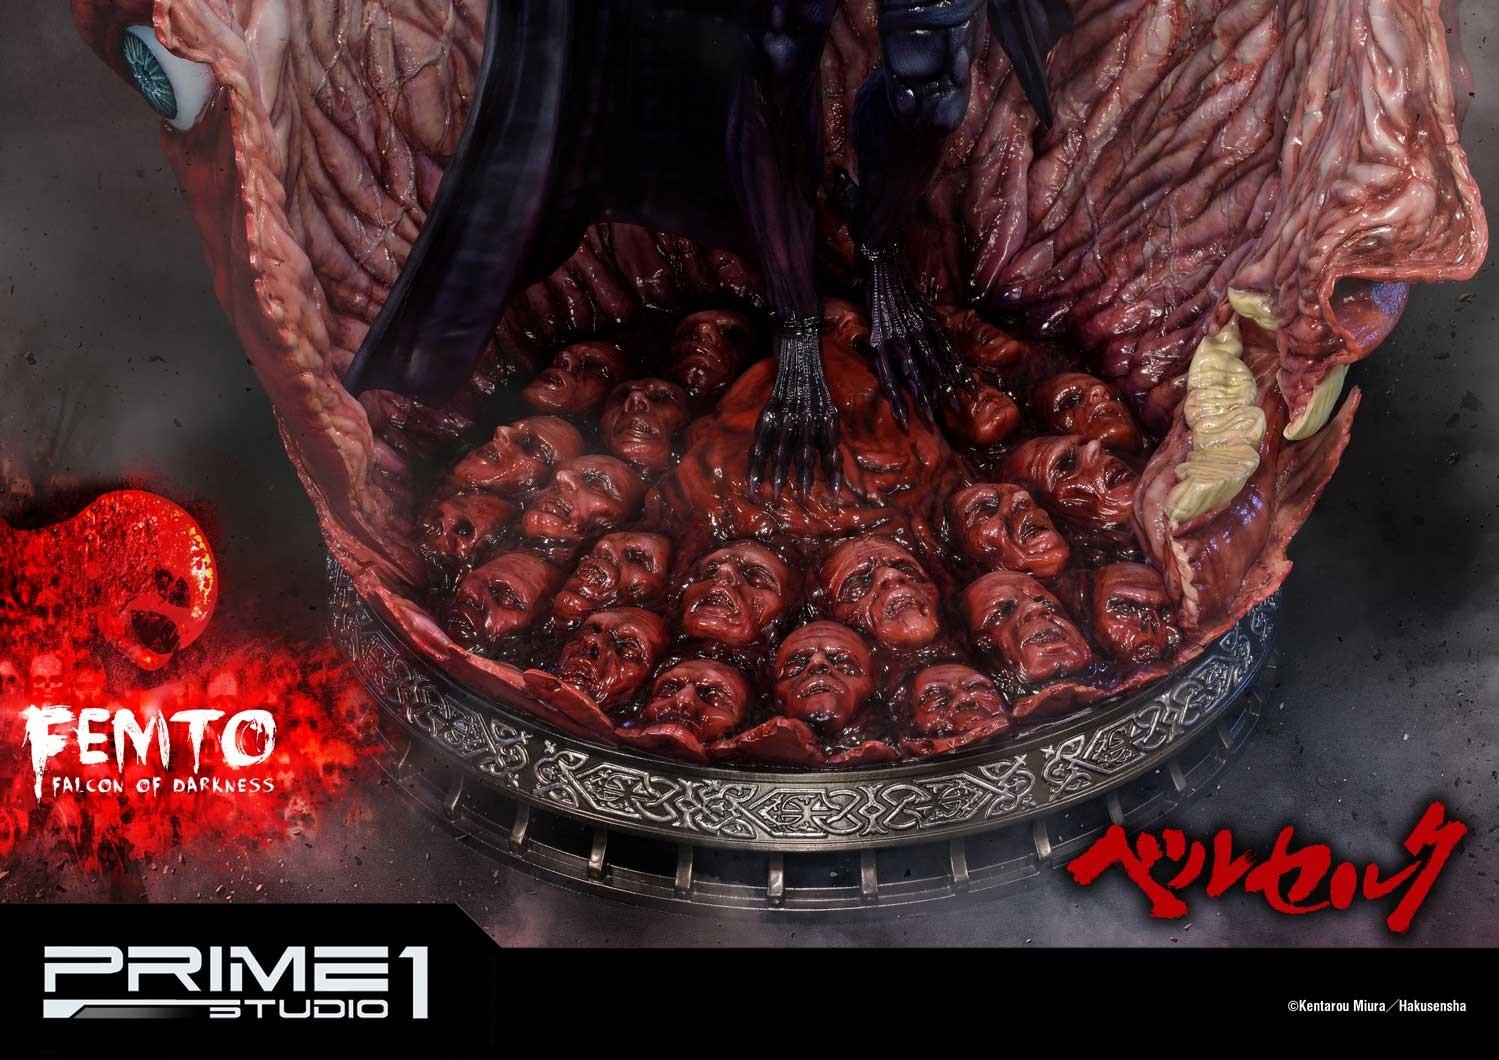 Link a Berserk Femto Falcon of Darkness Ultimate Premium Masterline Prime 1 Studio Itakon.it 30